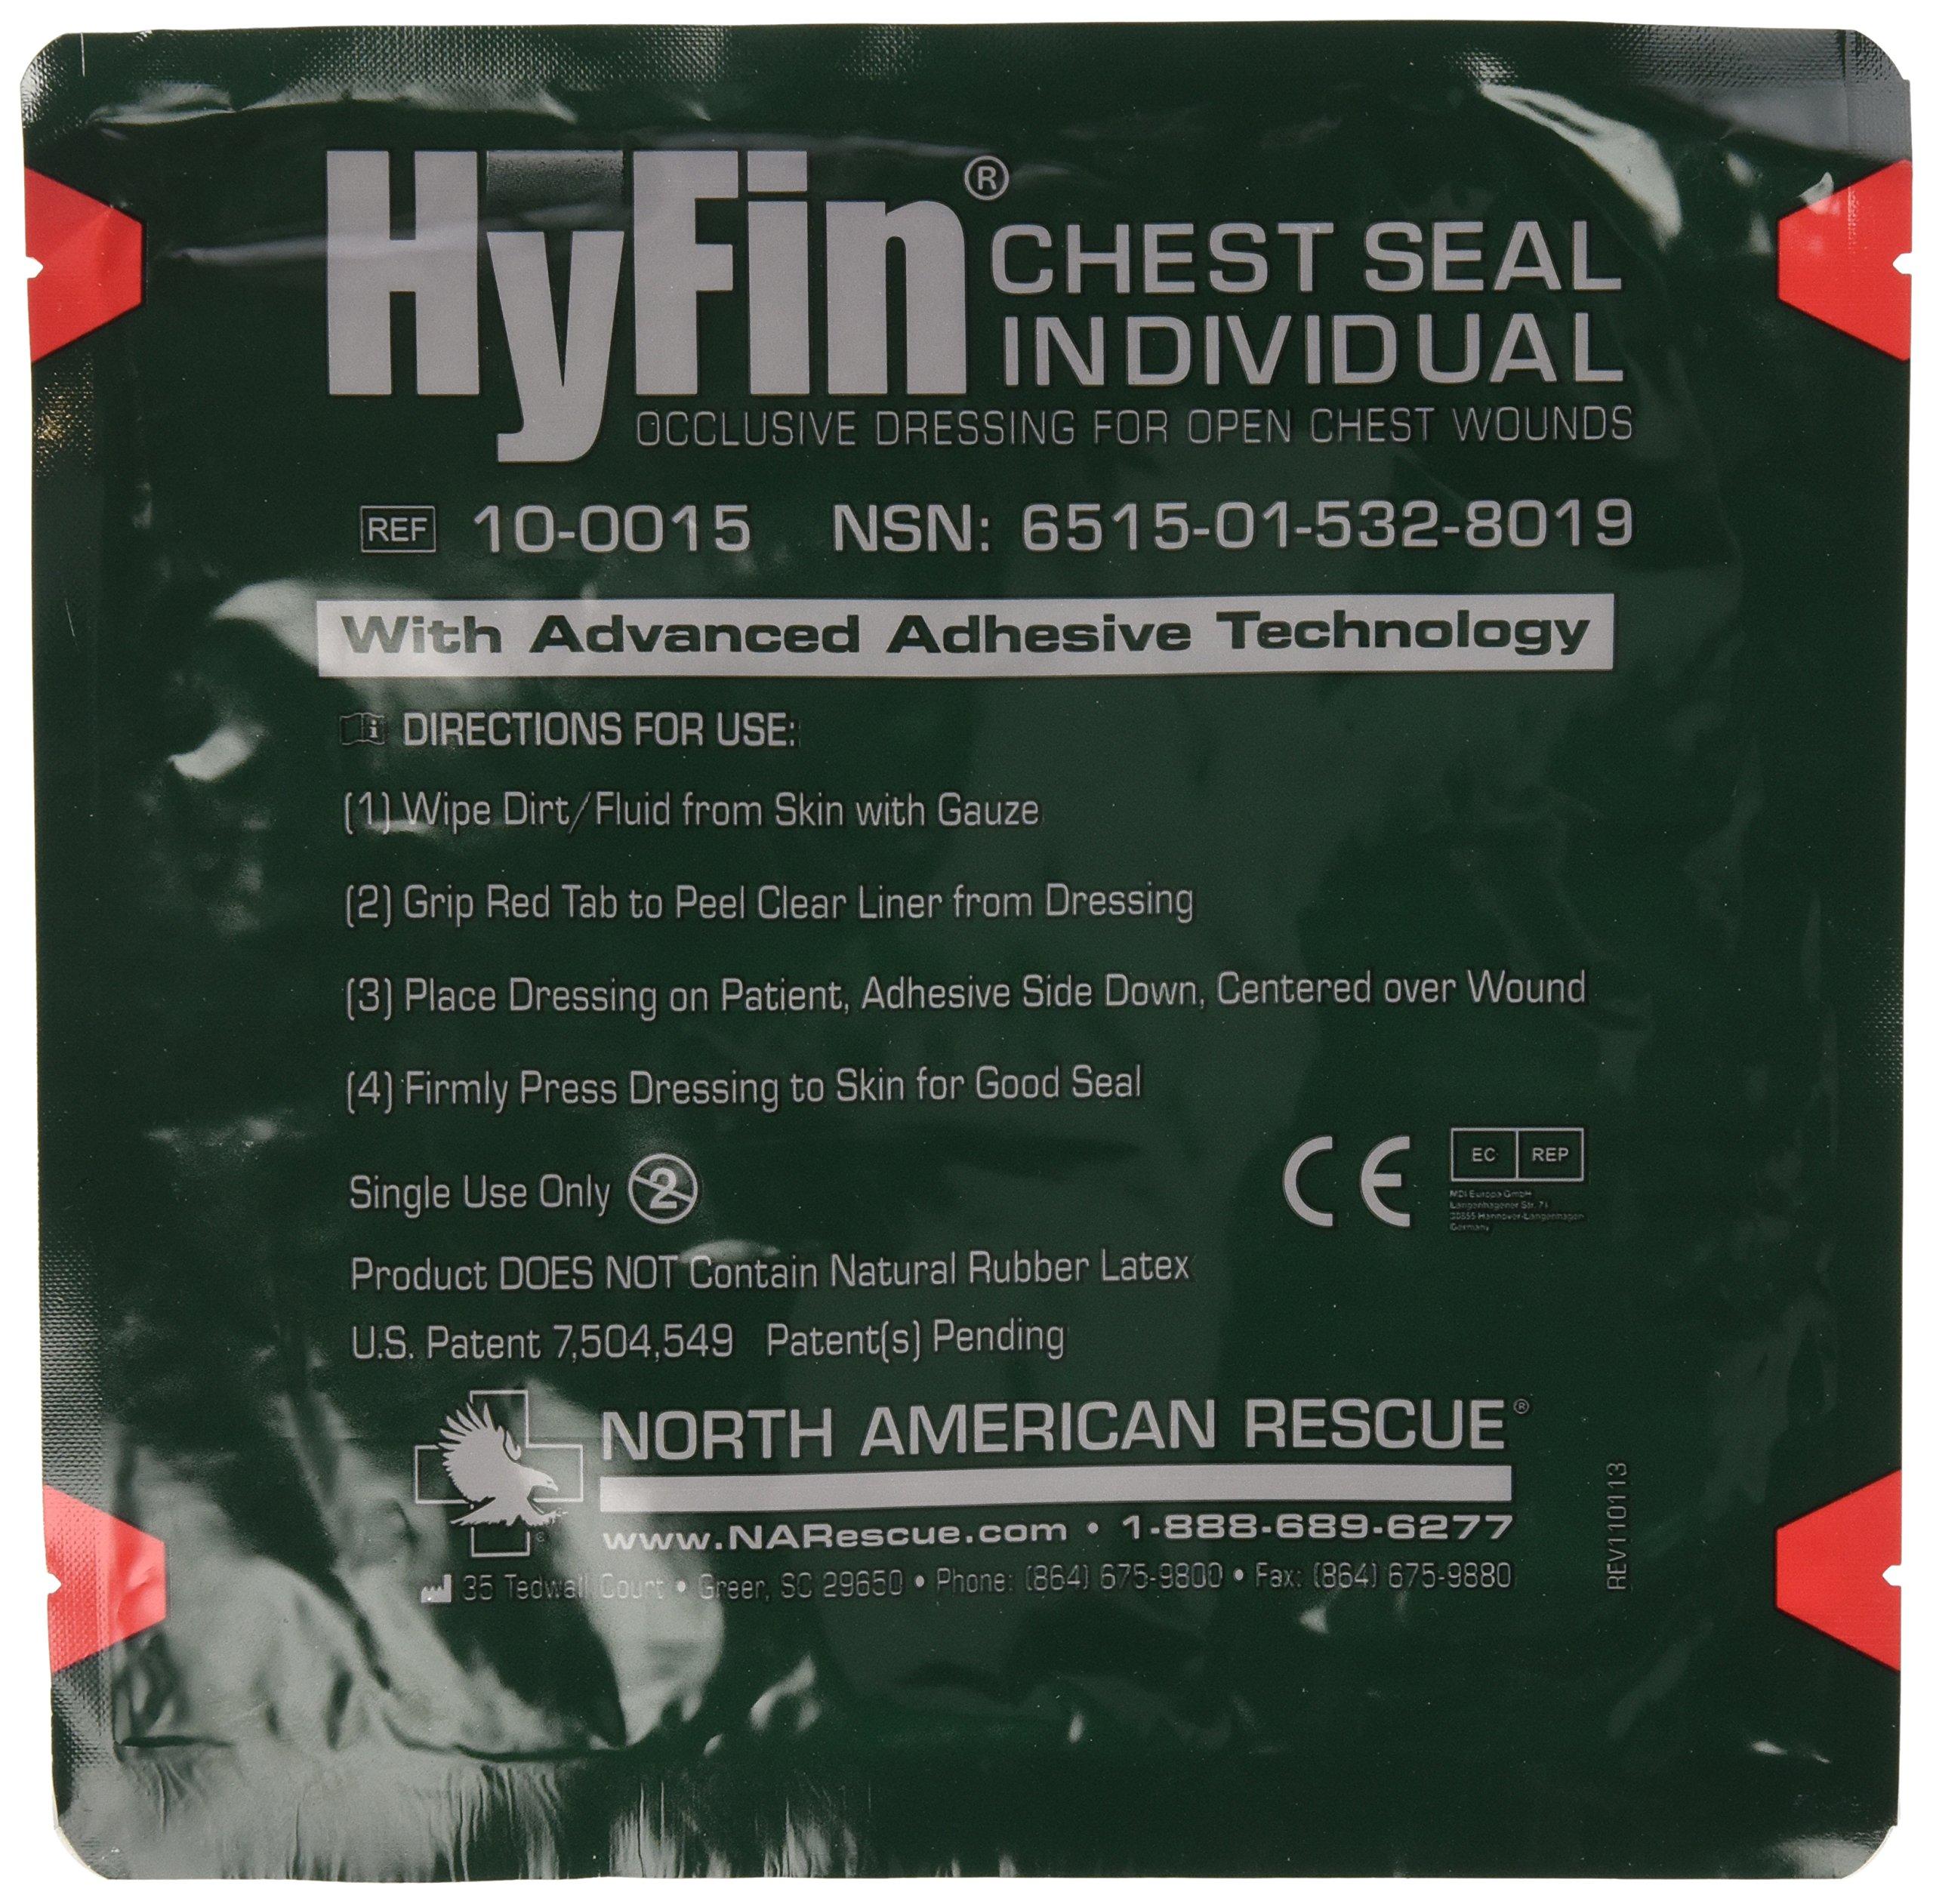 North American Rescue Hyfin Chest Seal Gauze REF 10-0015